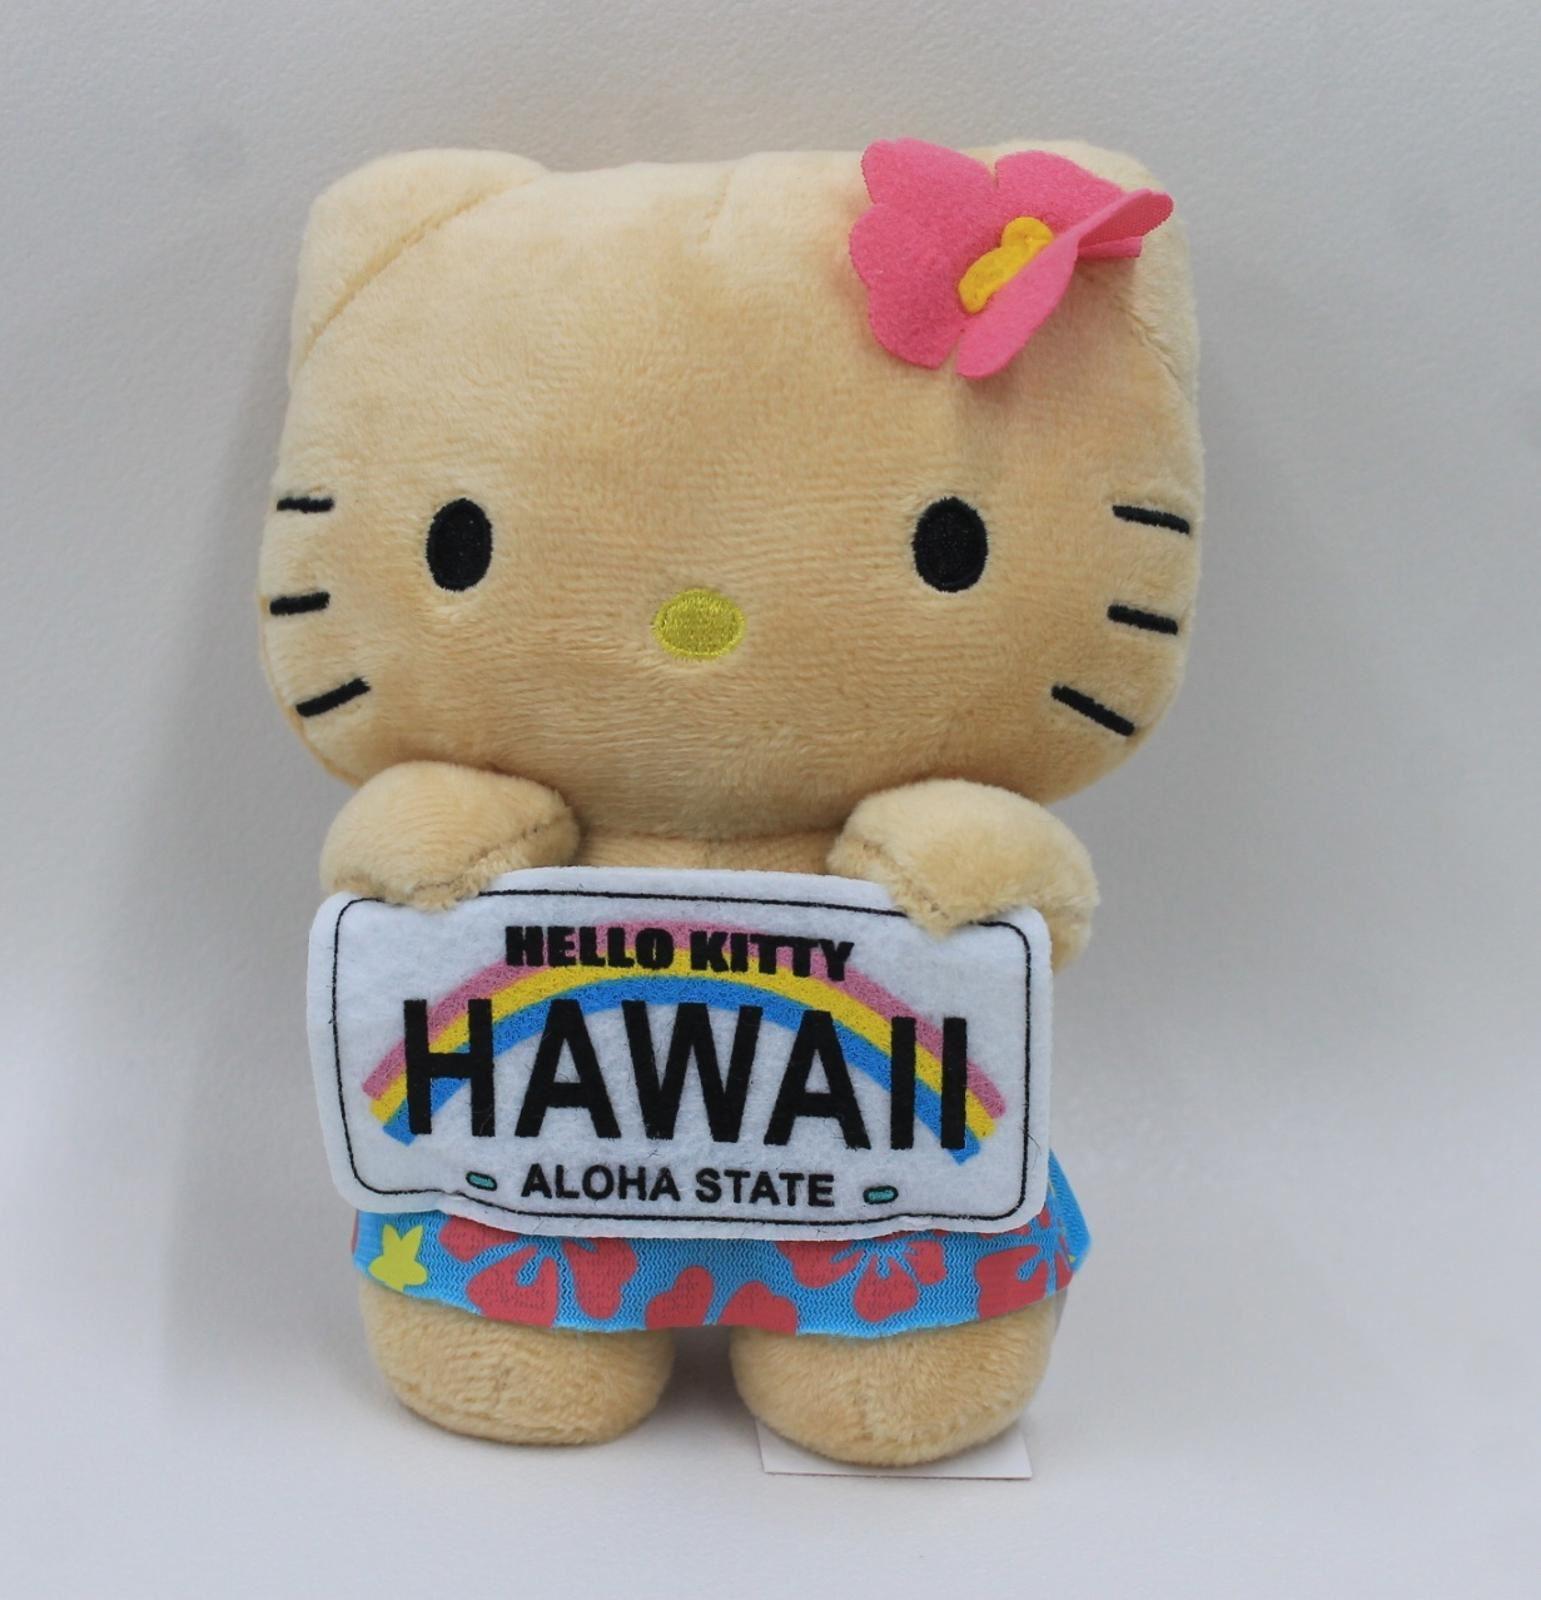 HELLO-KITTY-SANRIO-Hawaii-Aloha-State-License-Plate-Girls-Plush-Doll-Toy-BNWT